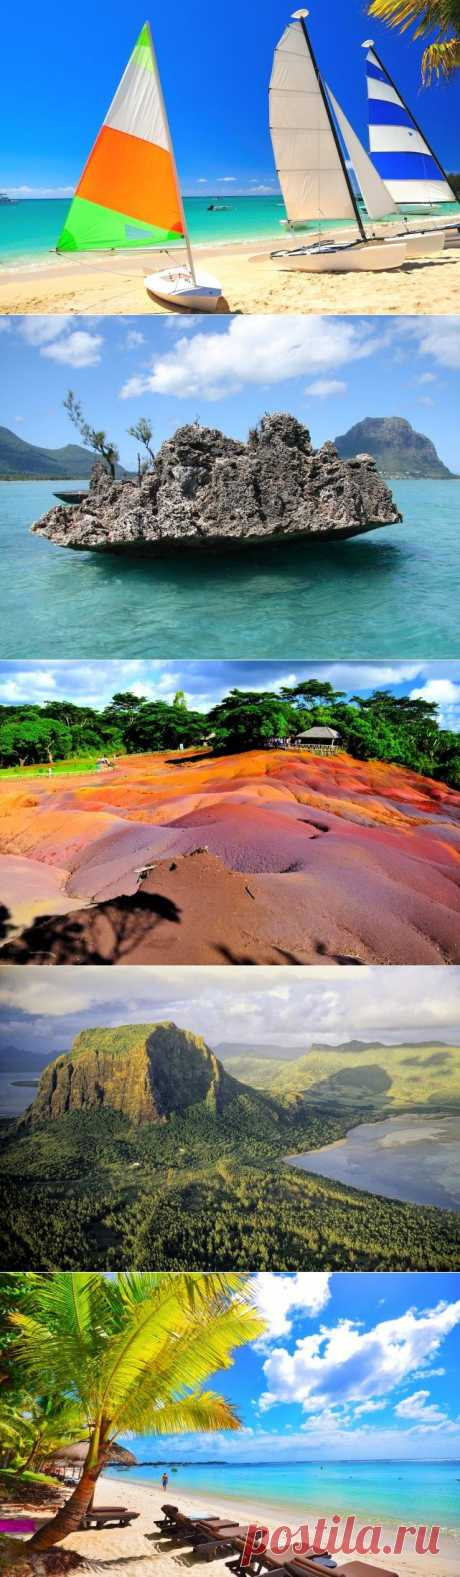 Яркий Маврикий / Туристический спутник